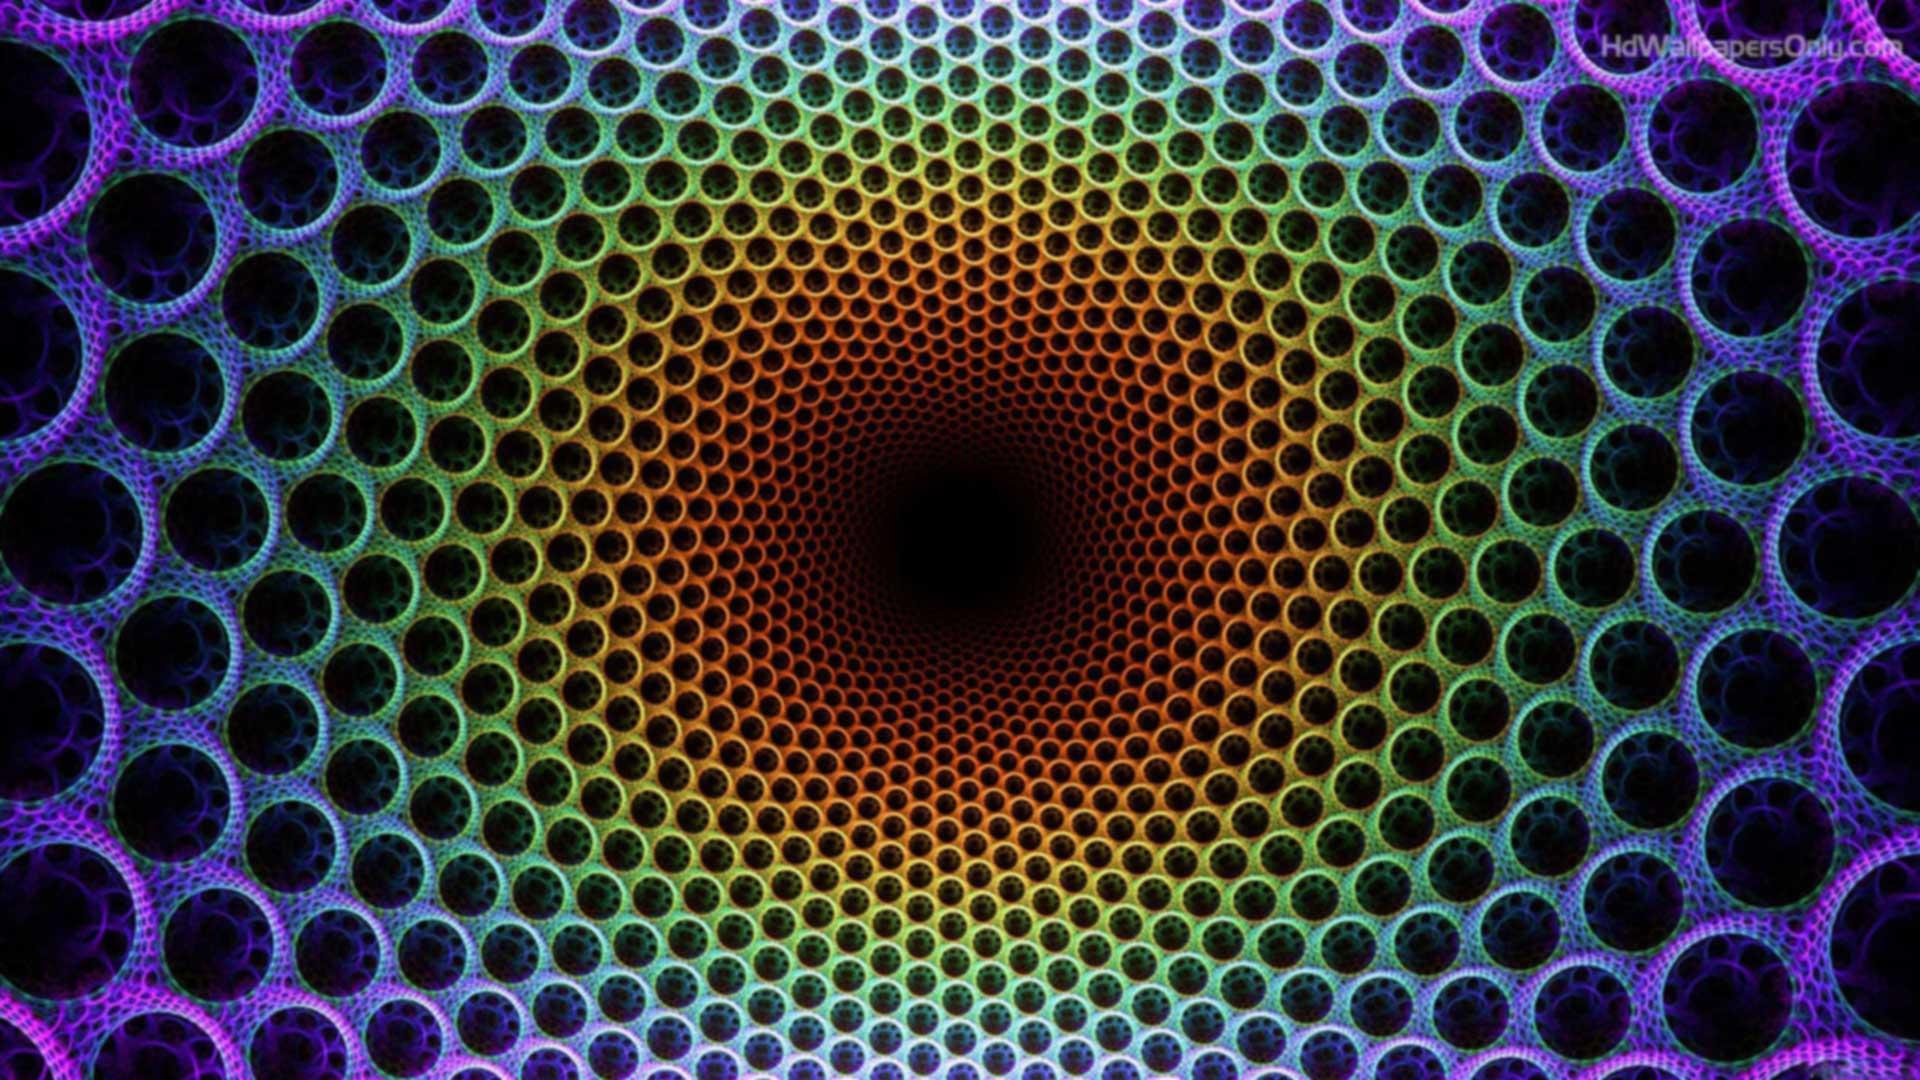 D-Illusion-wallpaper-wpc9003982